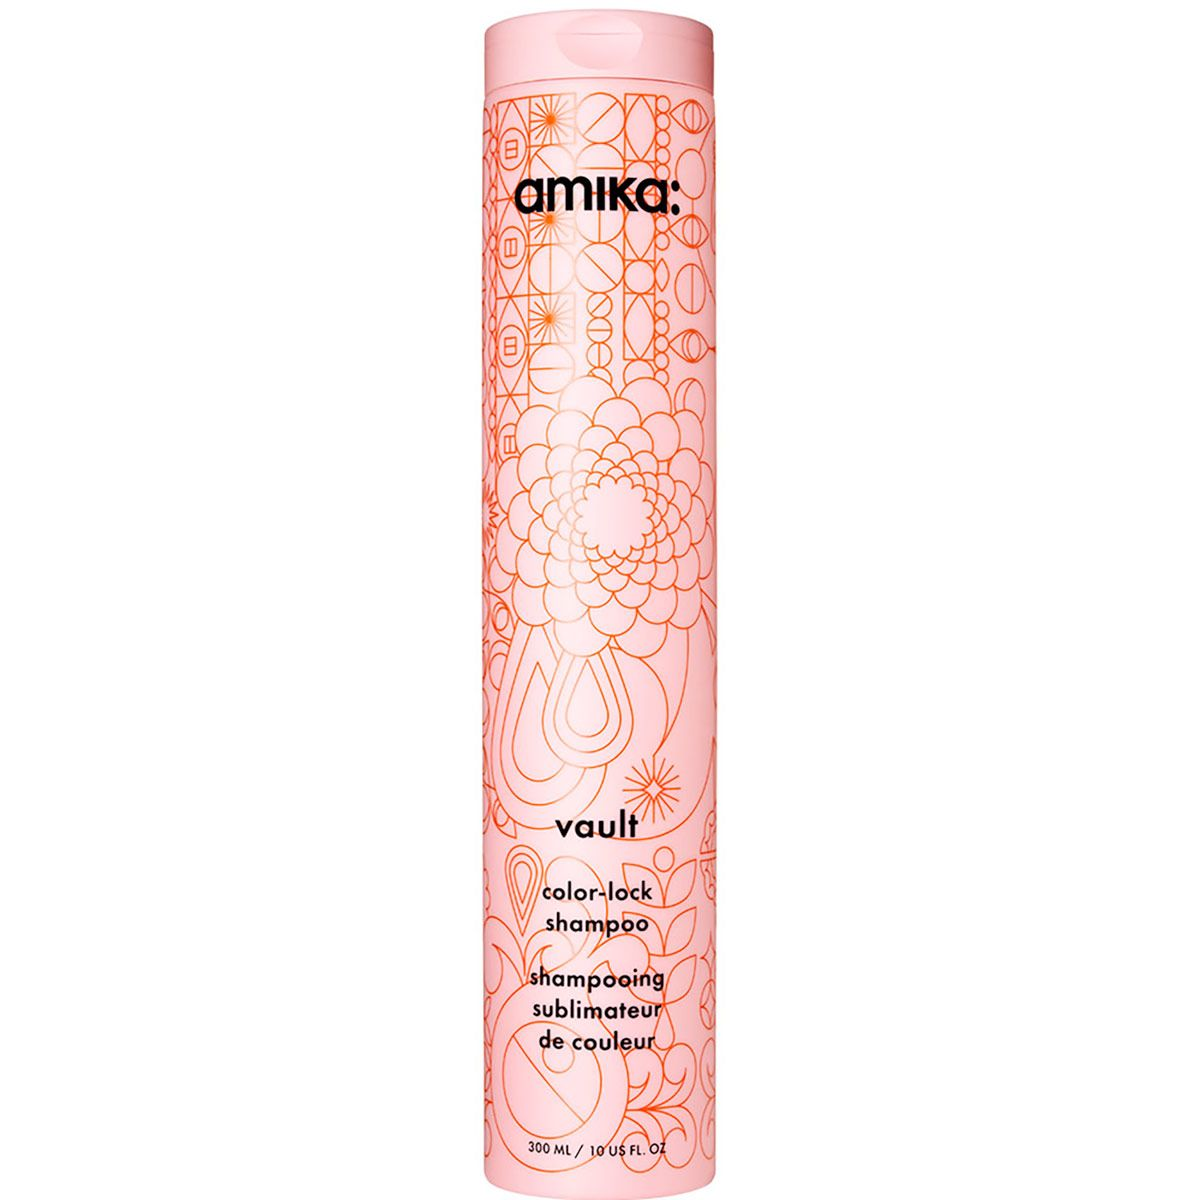 Amika Vault Color-Lock Shampoo 300ml